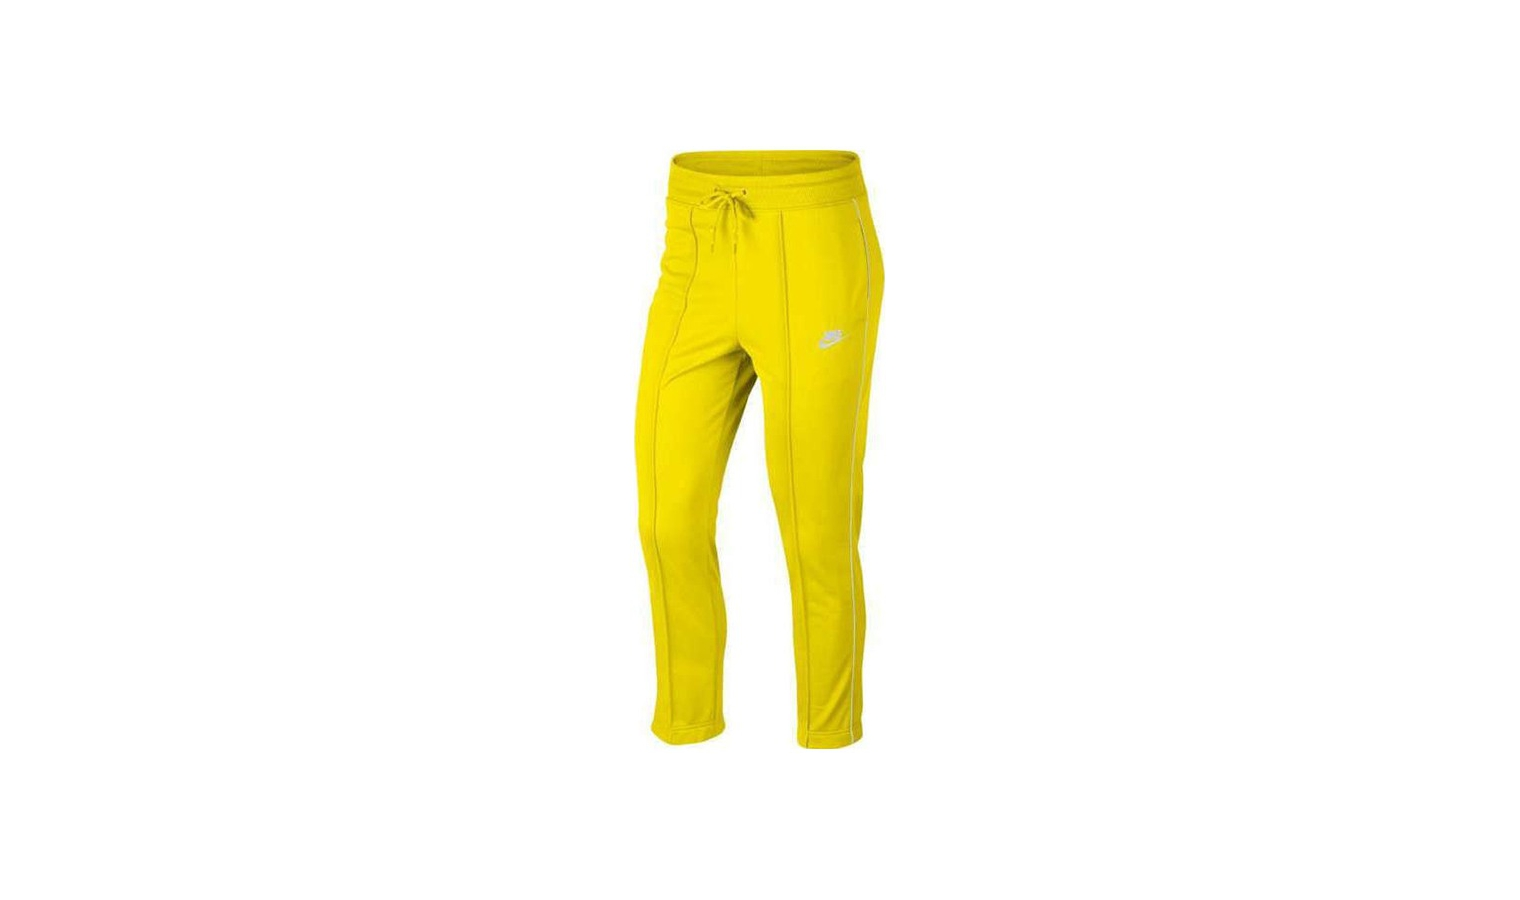 3dc71a0c1 ... nohavice · Dámske tepláky Nike W NSW HRTG PANT PK SLIM W žlté. Nové